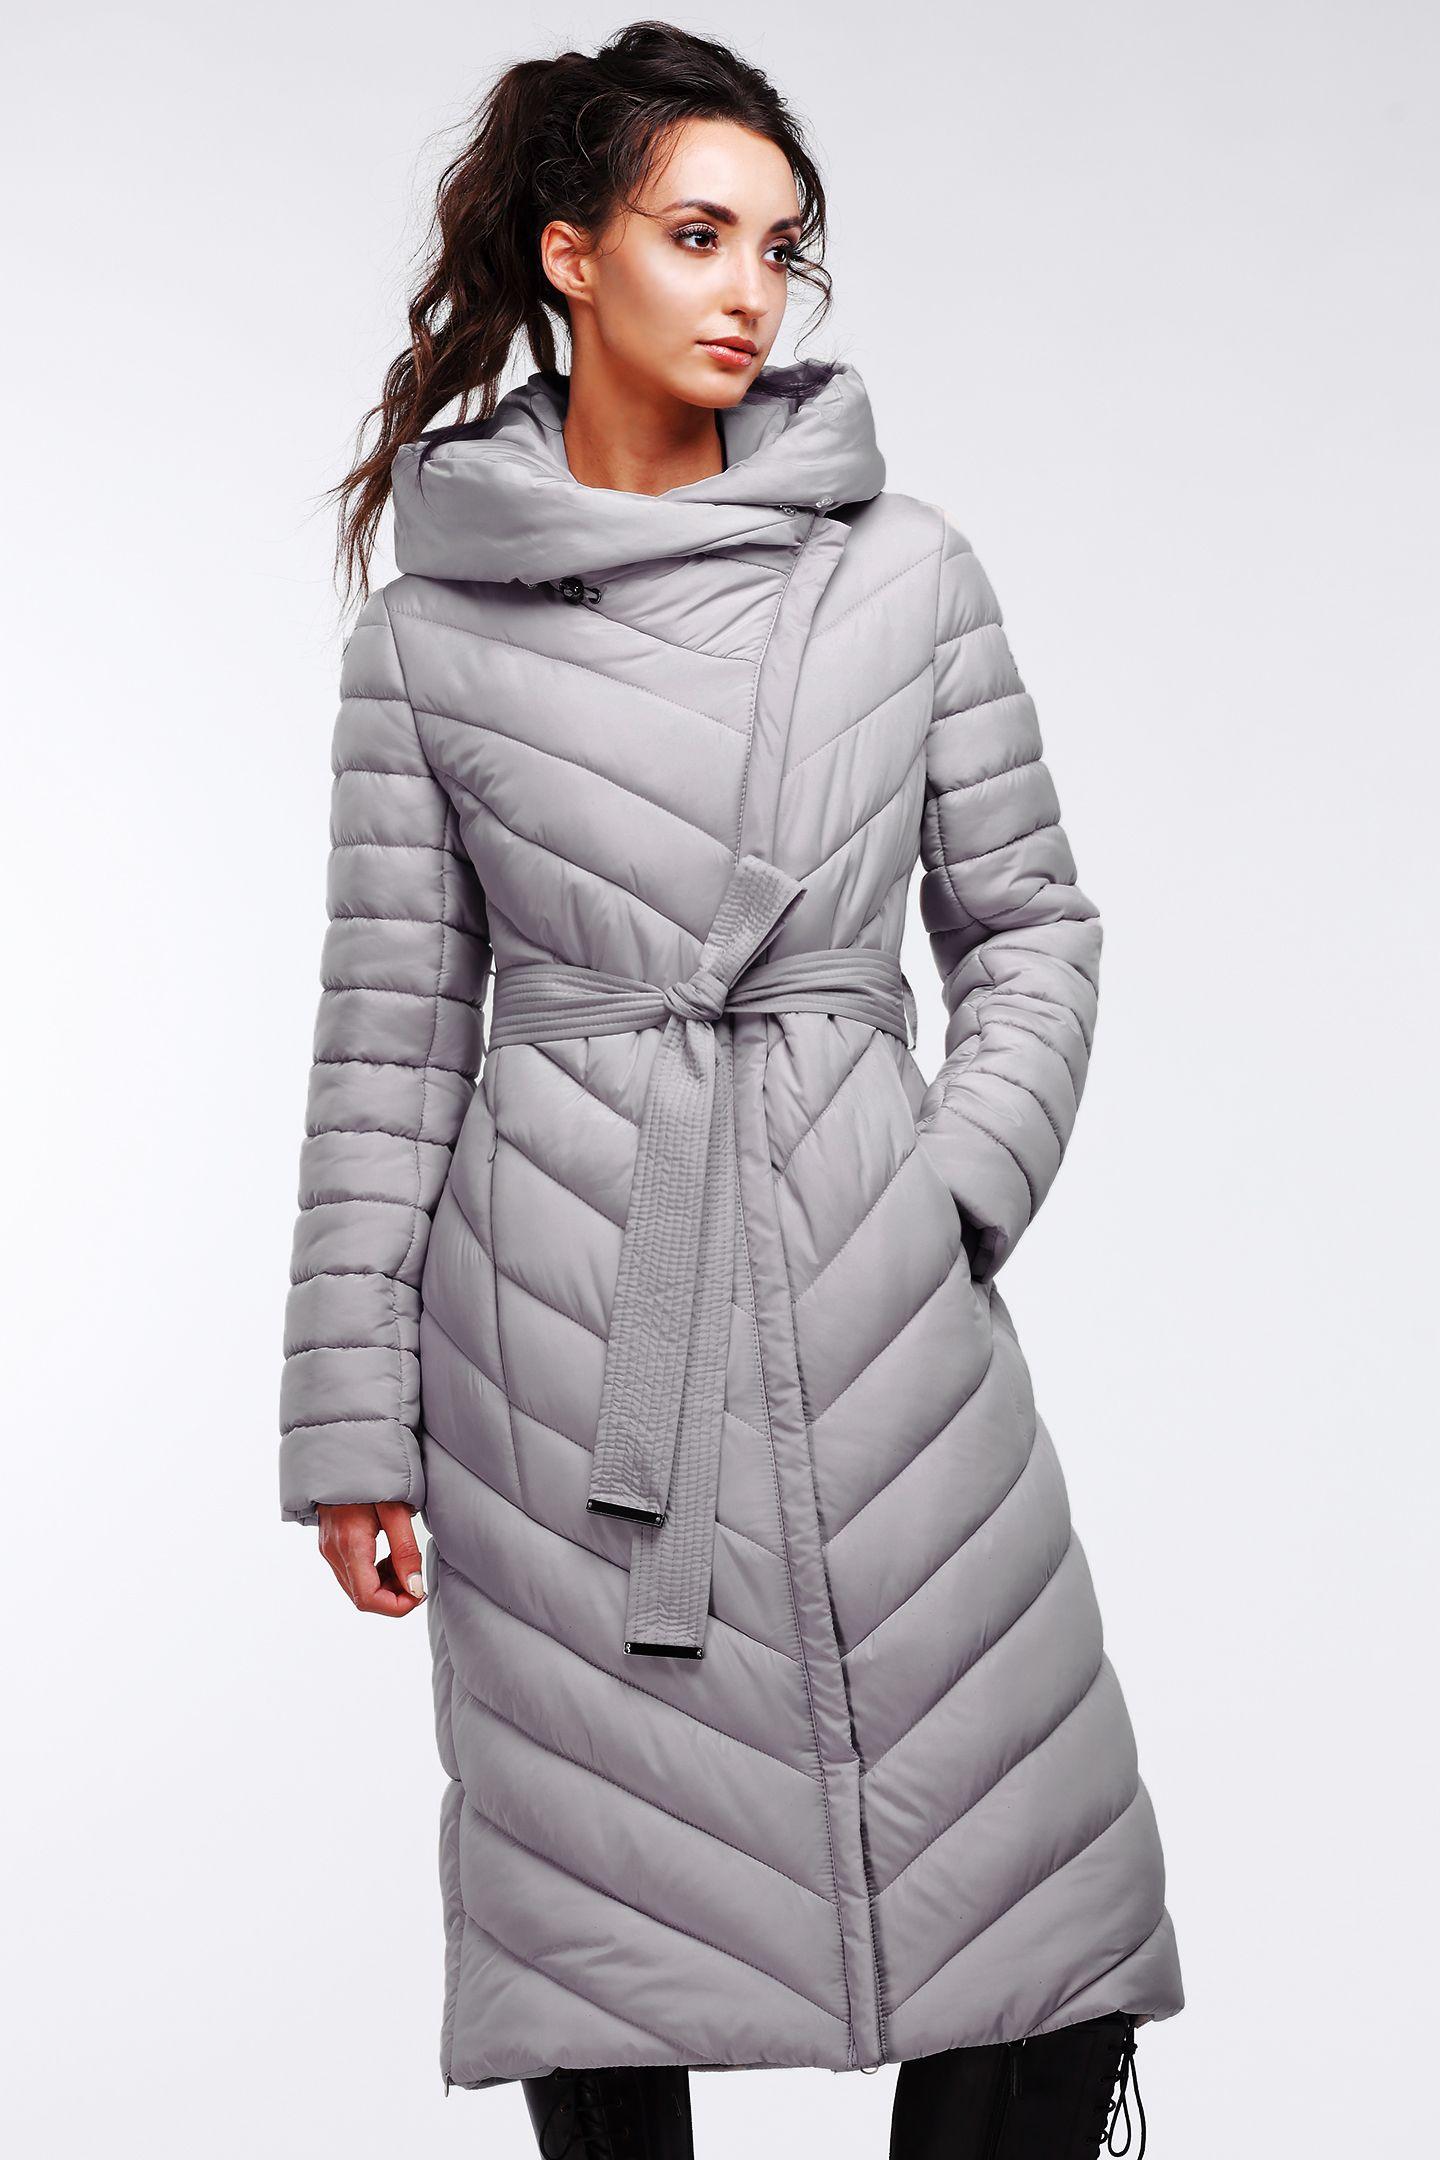 ddb75bda61ec Зимнее стеганое одеяло пуховик Фелиция от Nui Very - зимняя куртка женская  2017, зимний пуховик